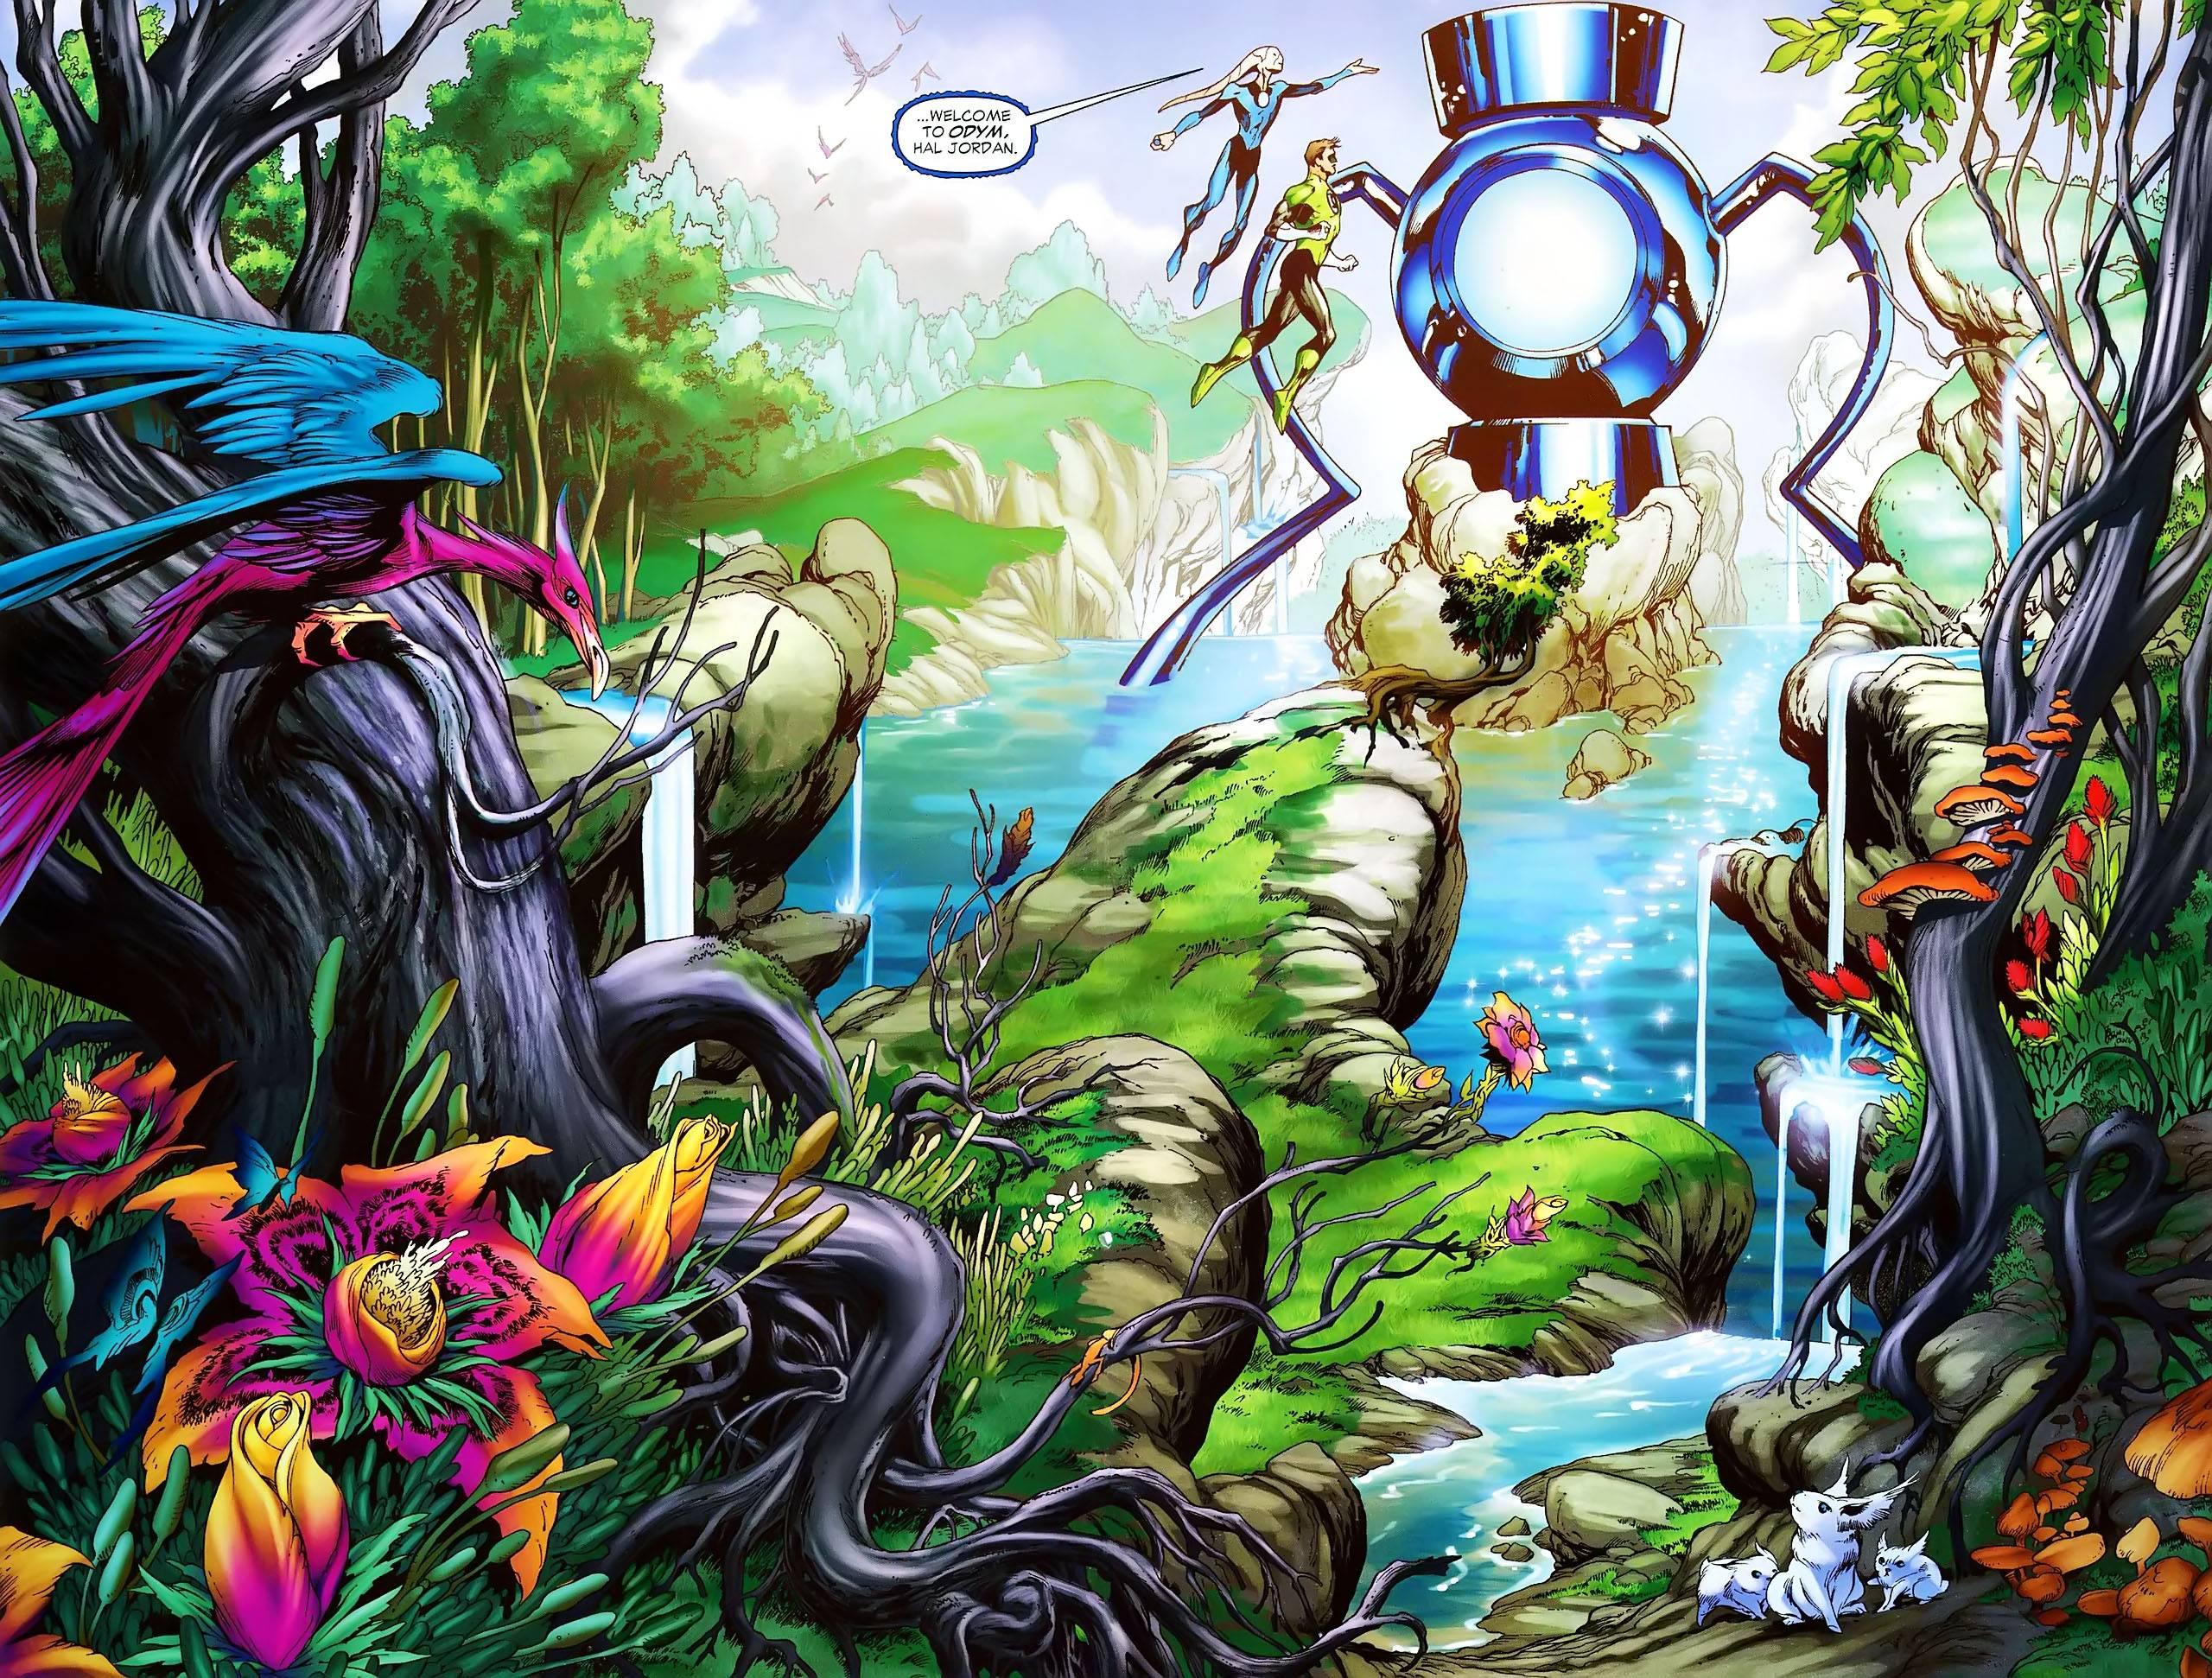 Blue Lantern Corps Wallpaper